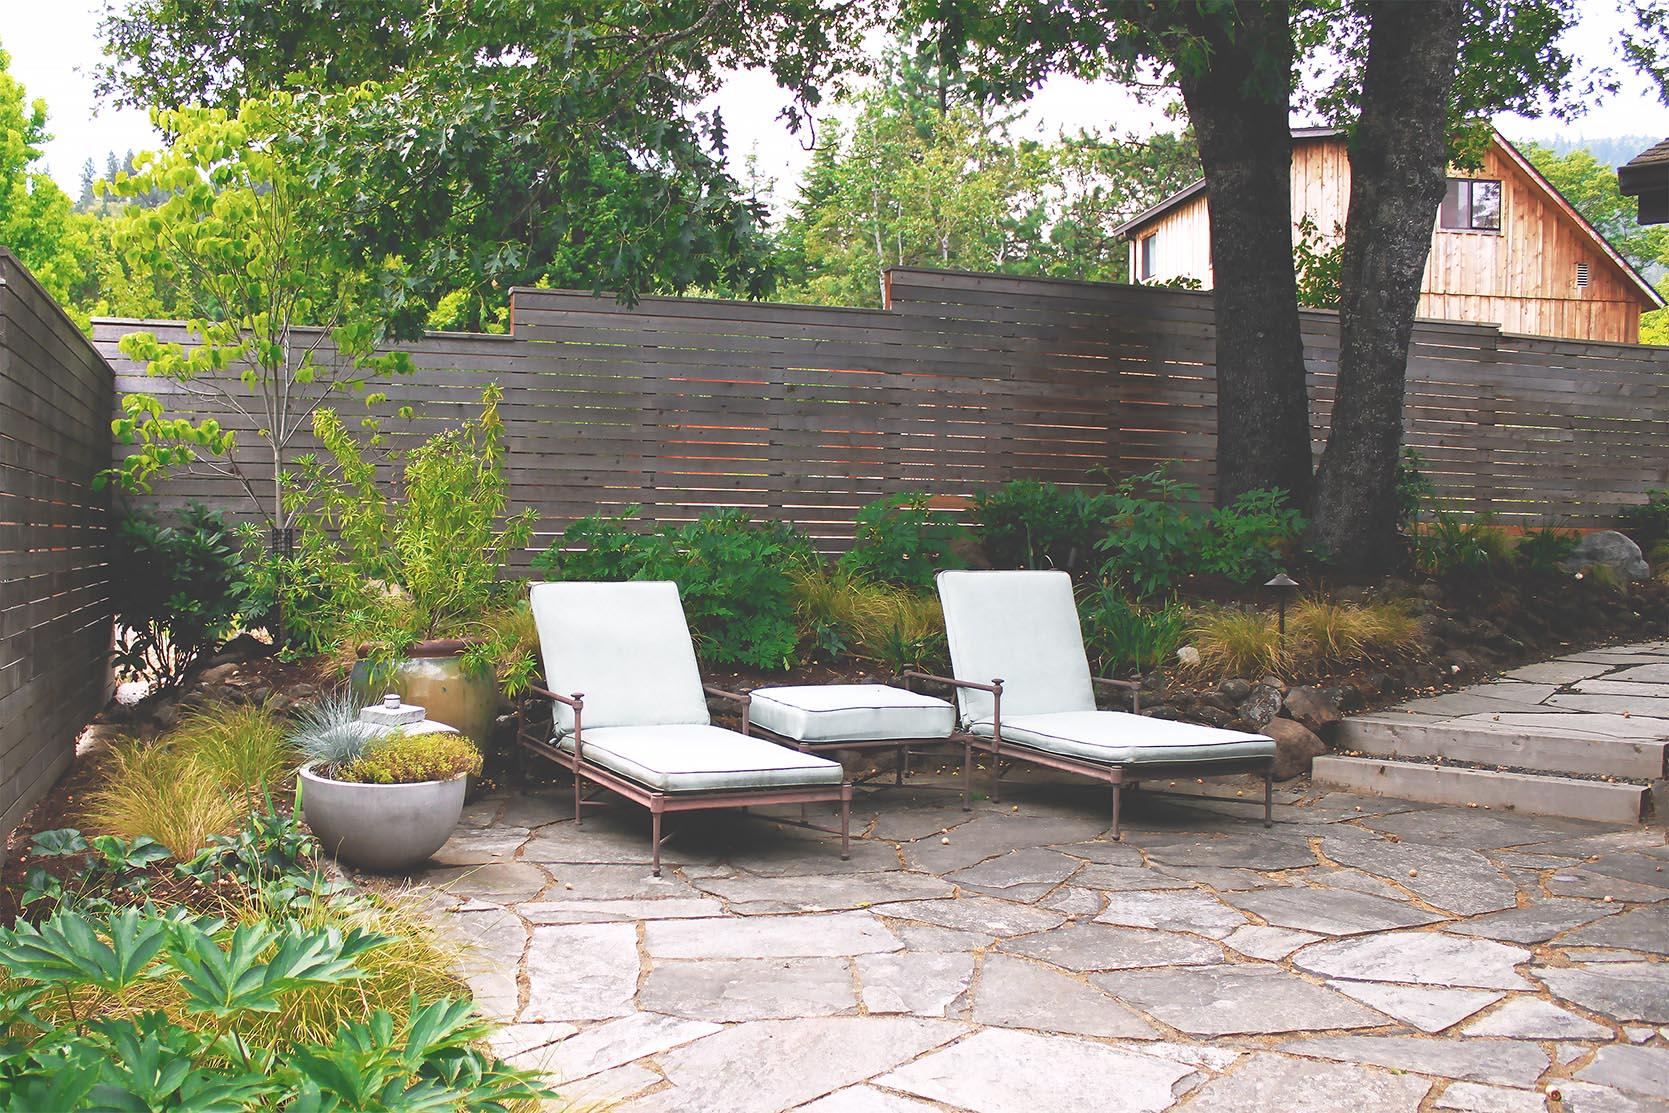 Flagstone Patio + Timber + Gravel Steps + Horizontal Cedar Slat Privacy Fence + Deer-Resistant Perennial Garden + Modern + Seating Area